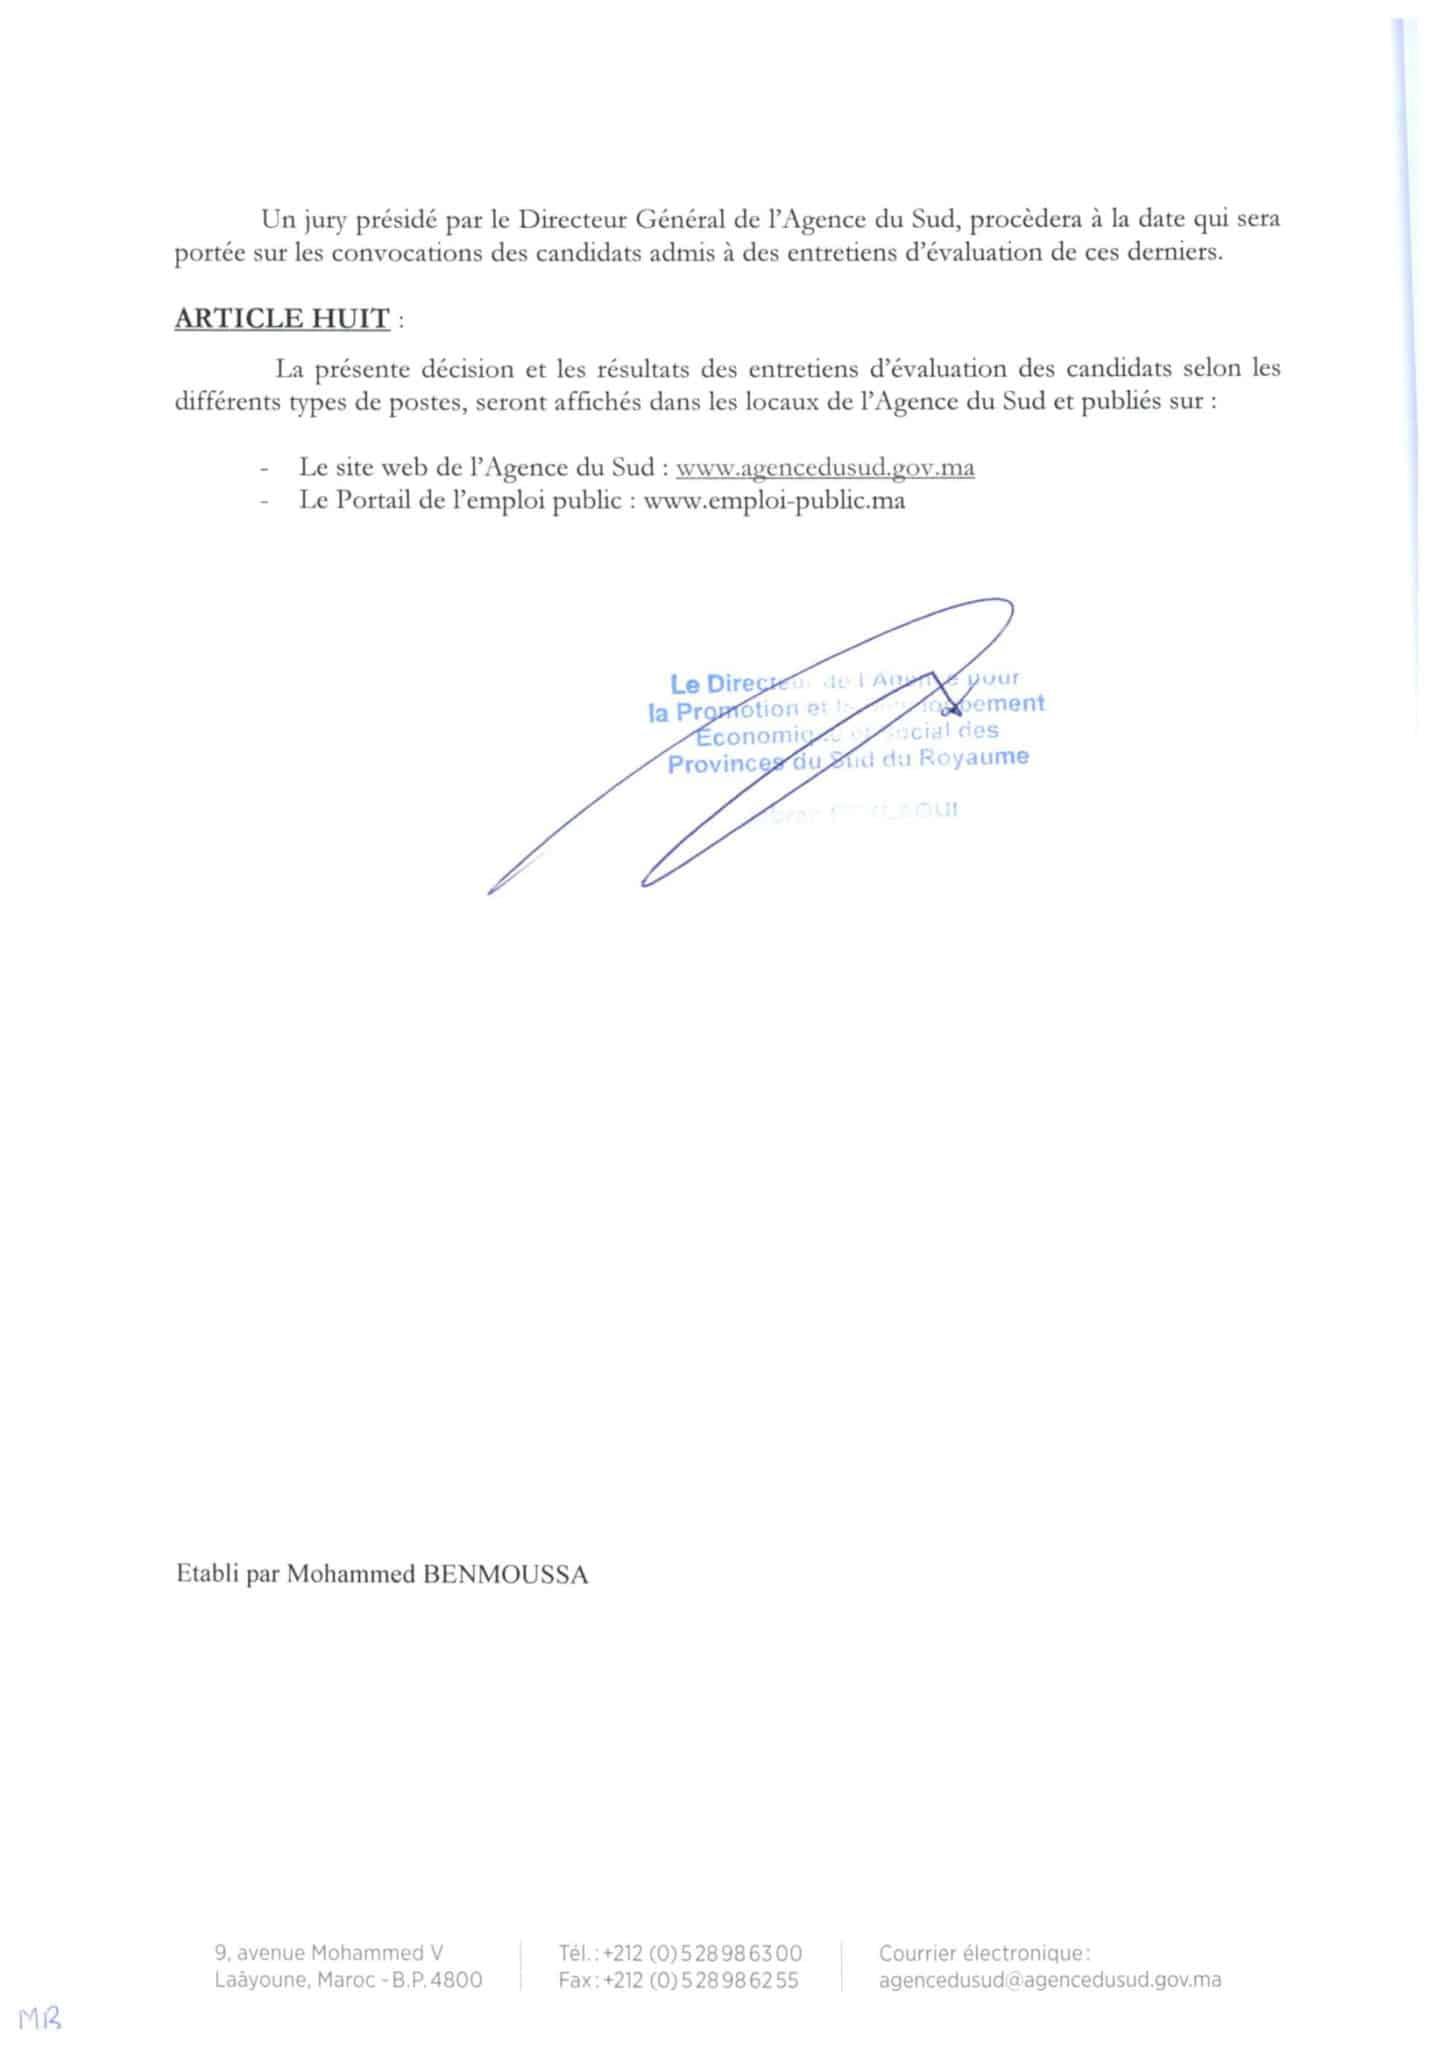 concours-apds-4-postes- maroc-alwadifa.com